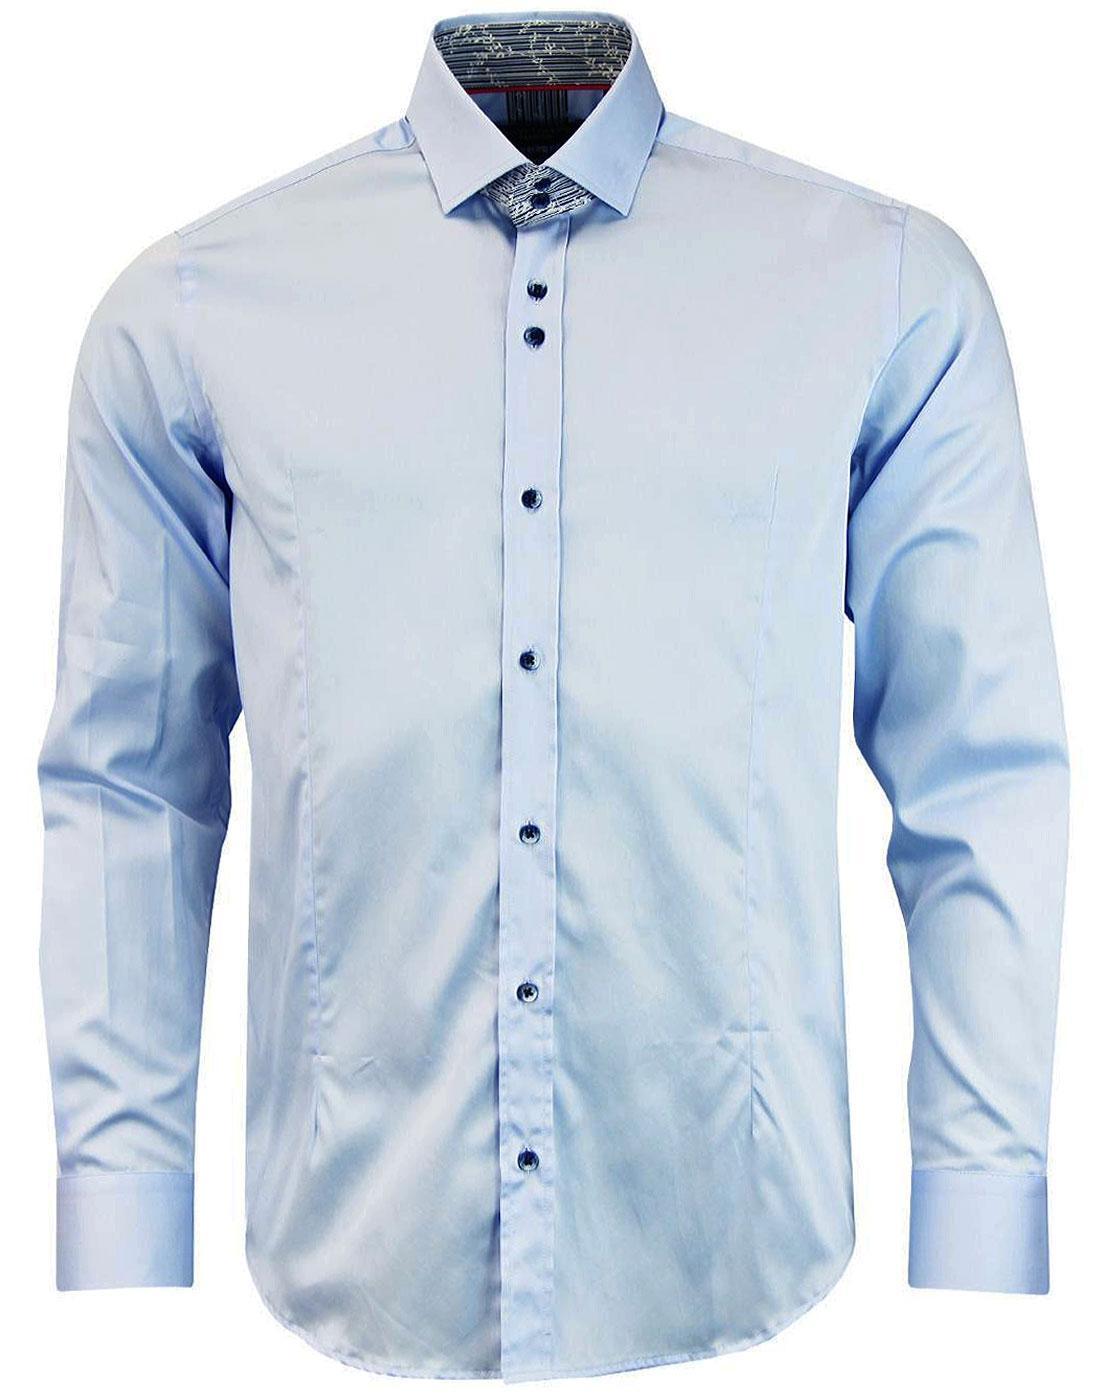 GUIDE LONDON Mod Floral Stripe Trim Plain Shirt